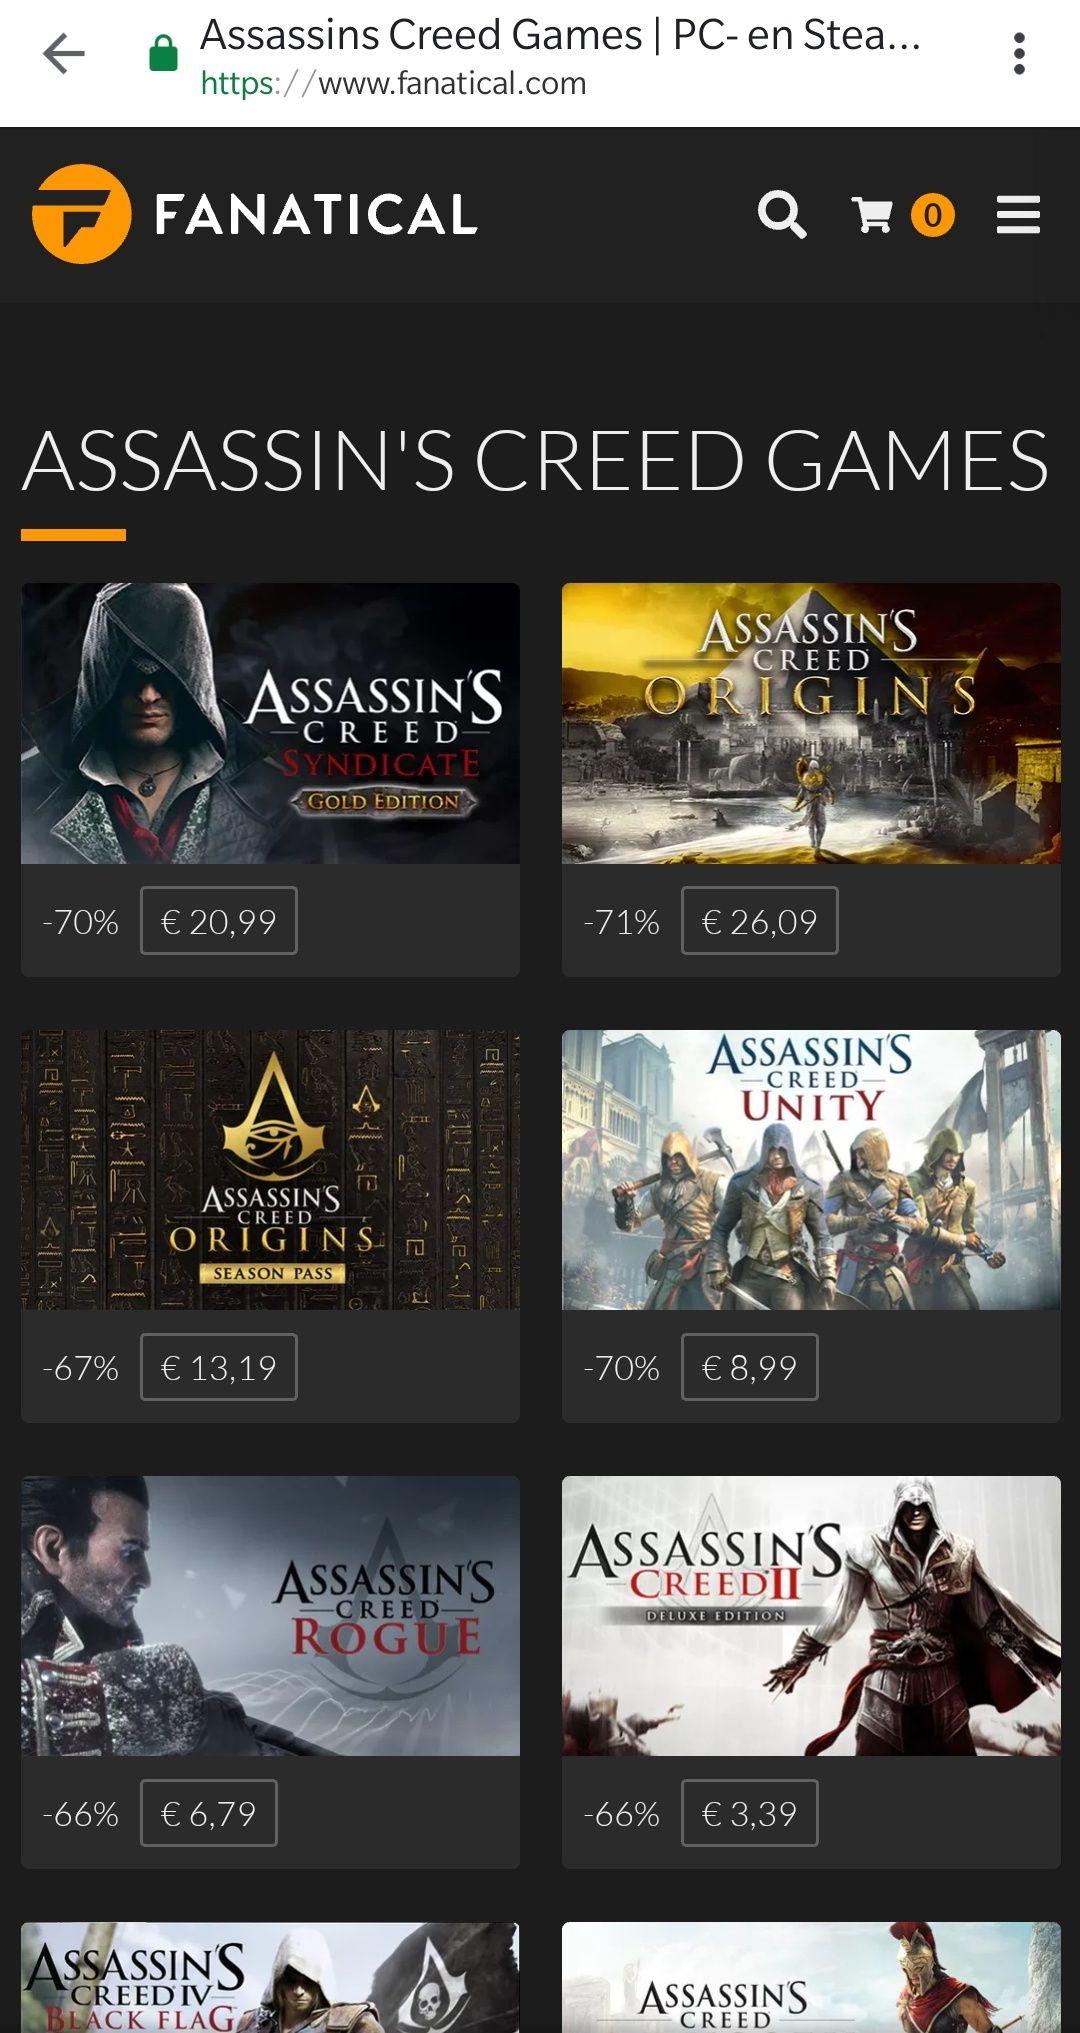 [Fanatical] tot 70% korting op Assassin's Creed games en season pass